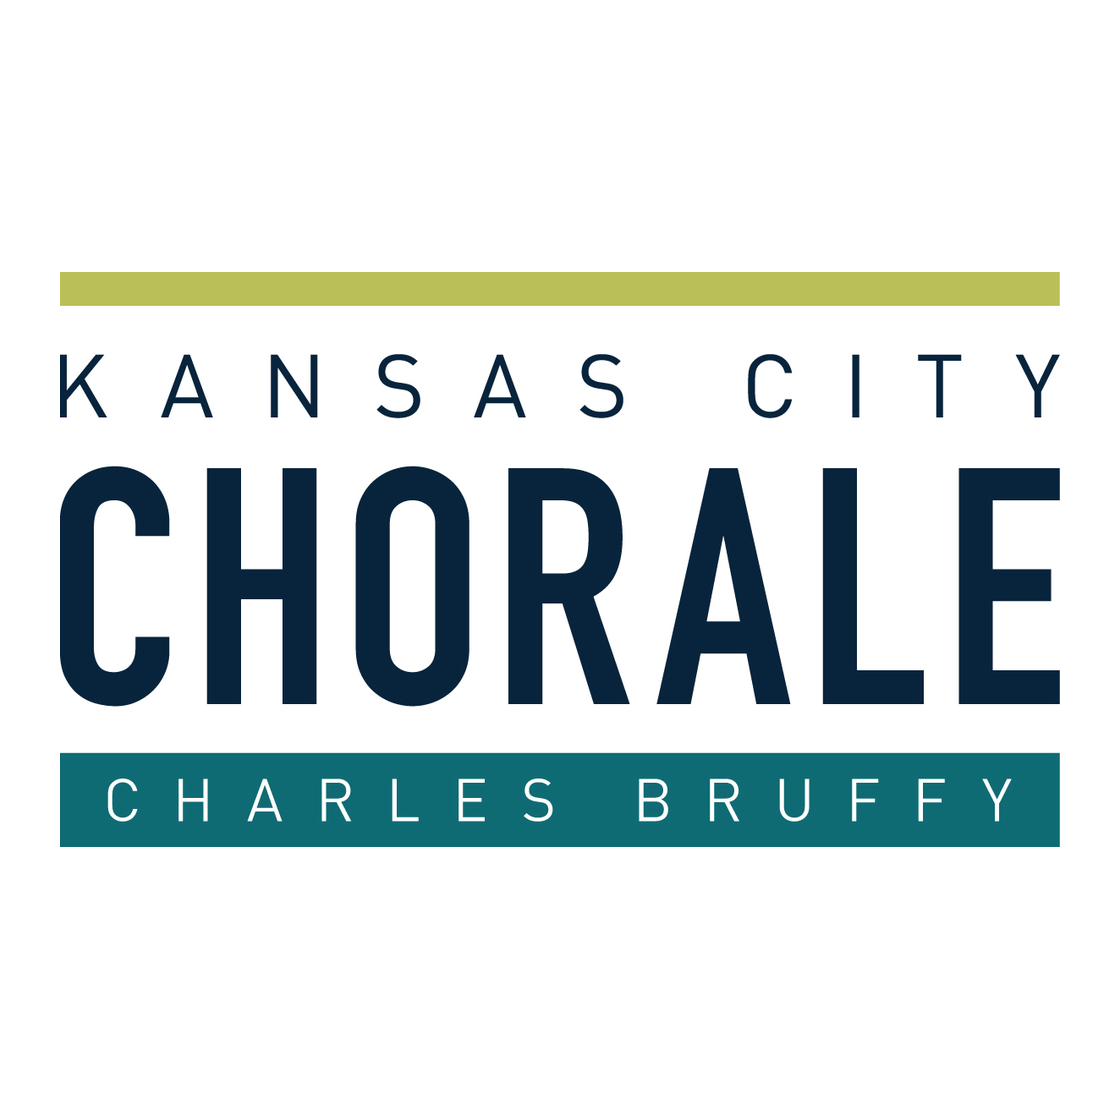 Kansas City Chorale located in Kansas City MO